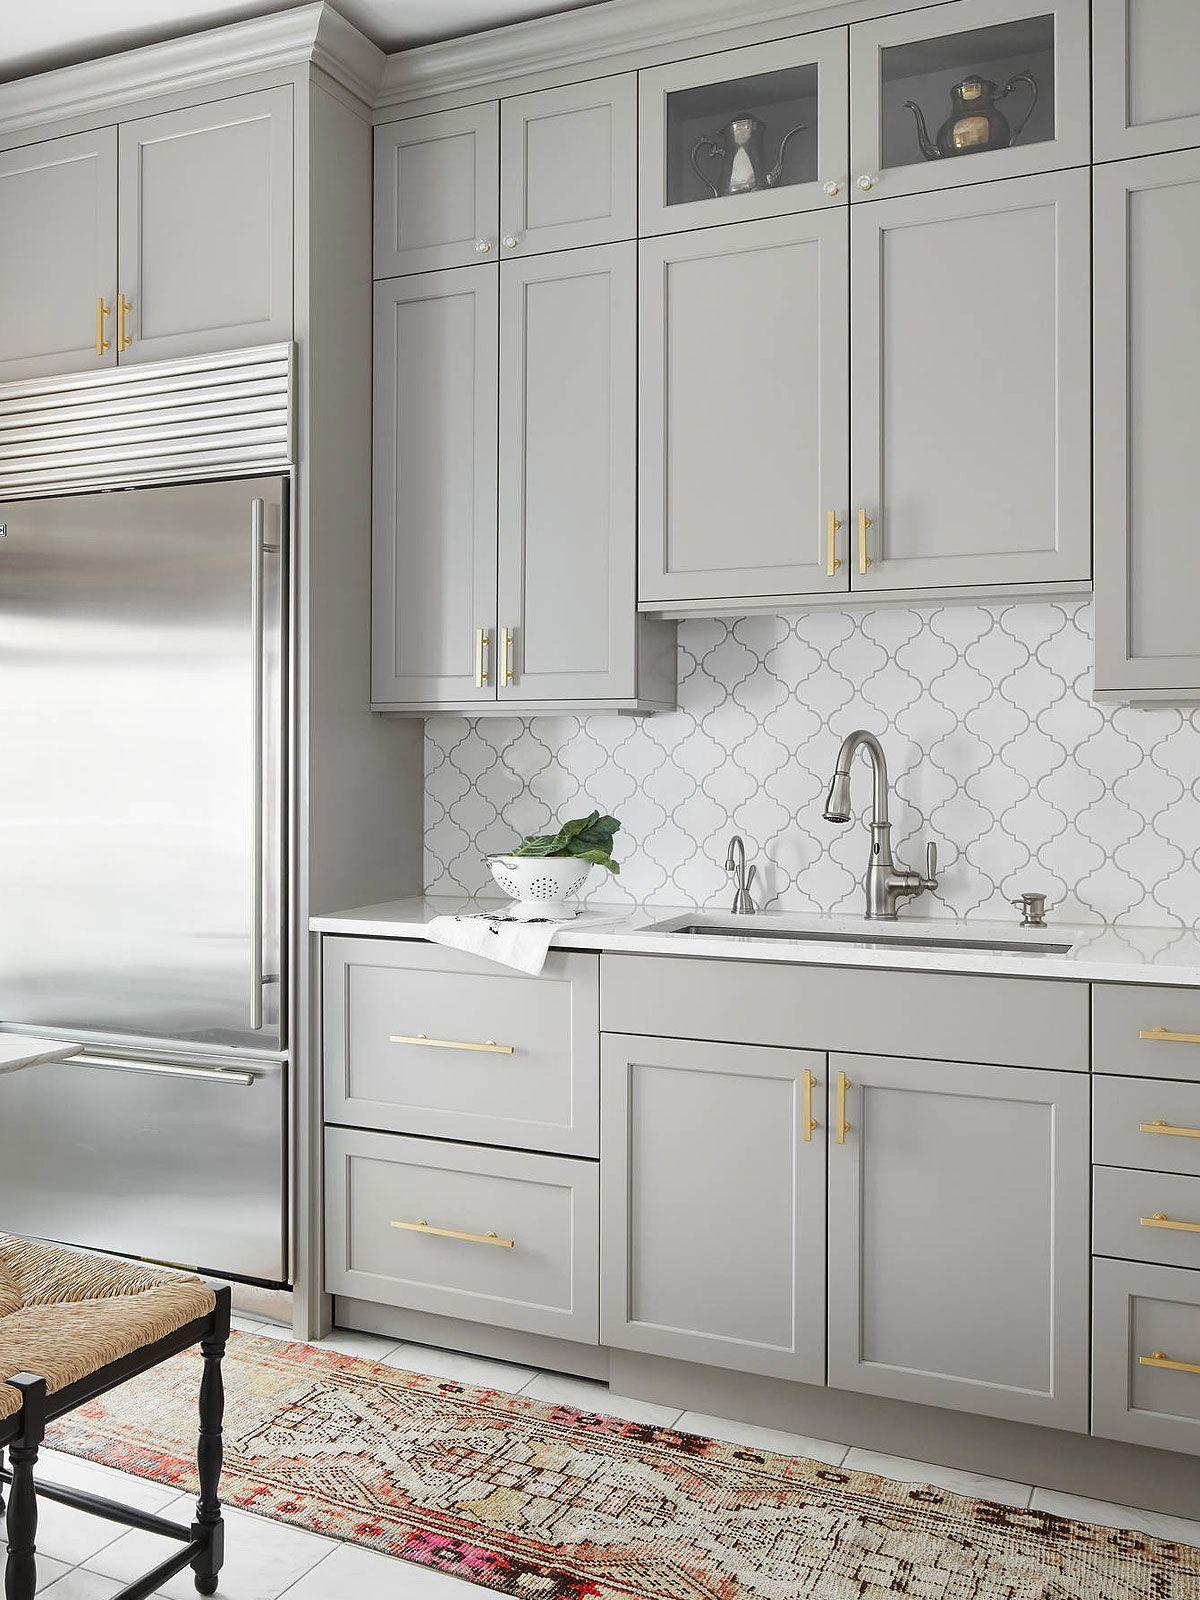 14 Pvc Kitchen Cabinets Ideas Kitchen Cabinets Kitchen Design Kitchen Renovation